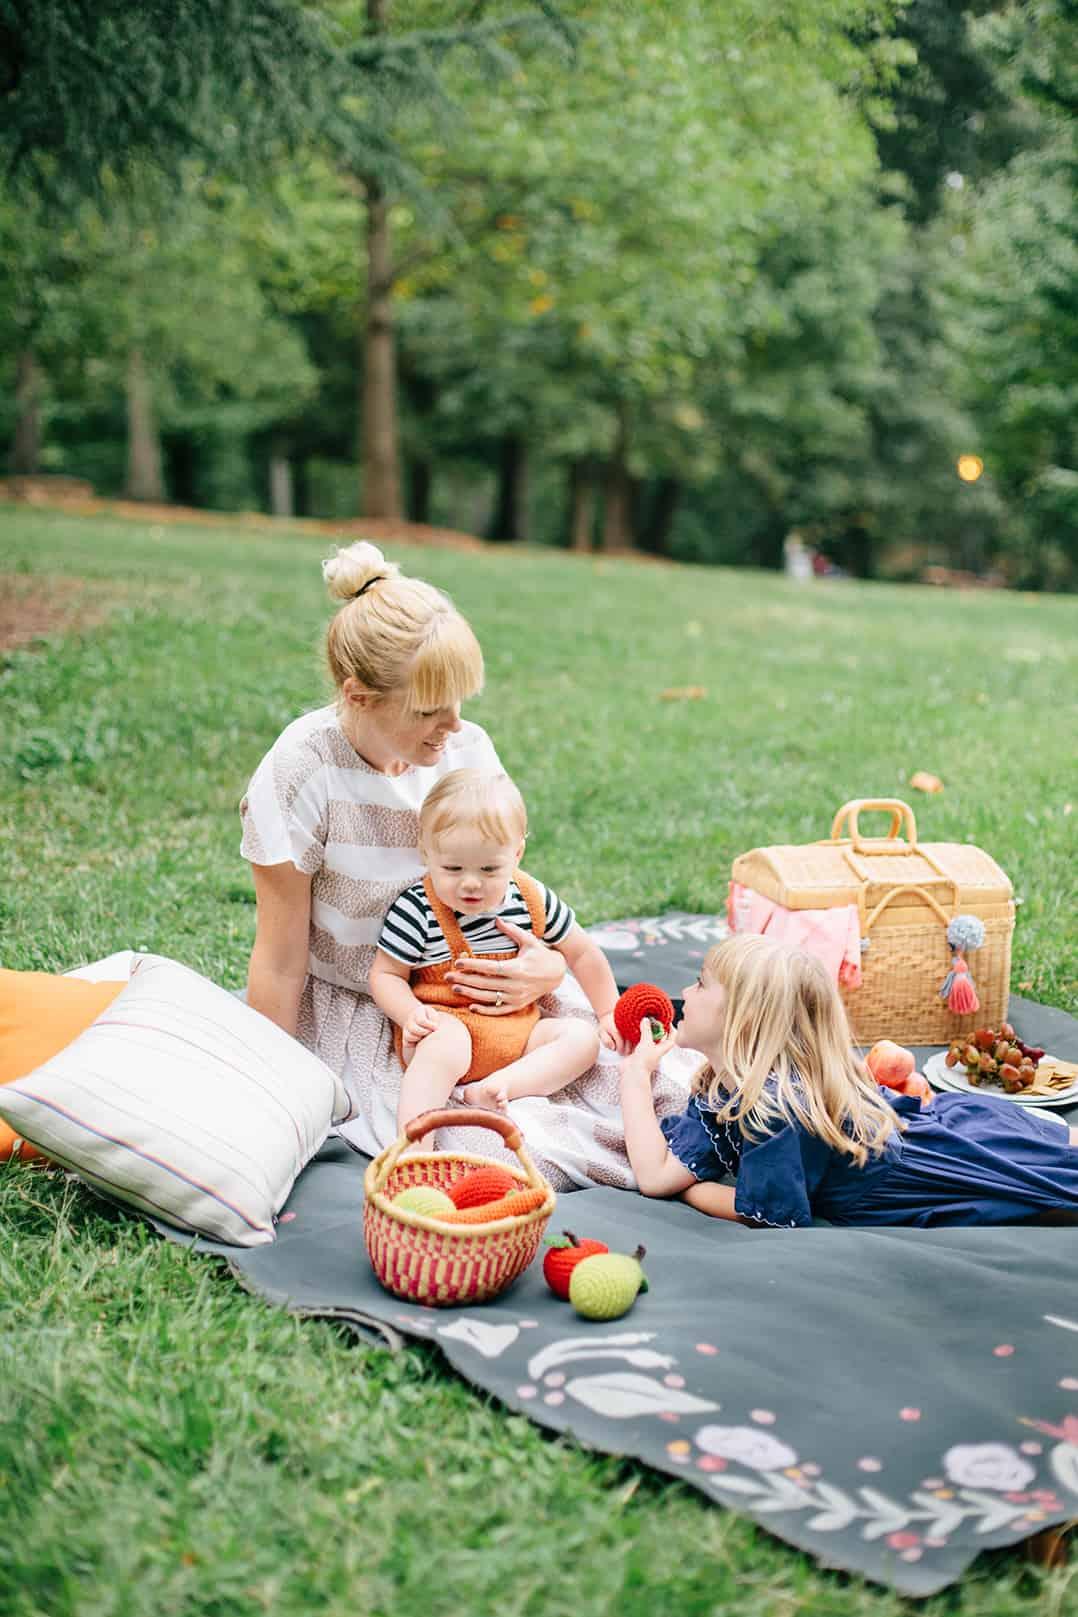 Fall picnic blanket